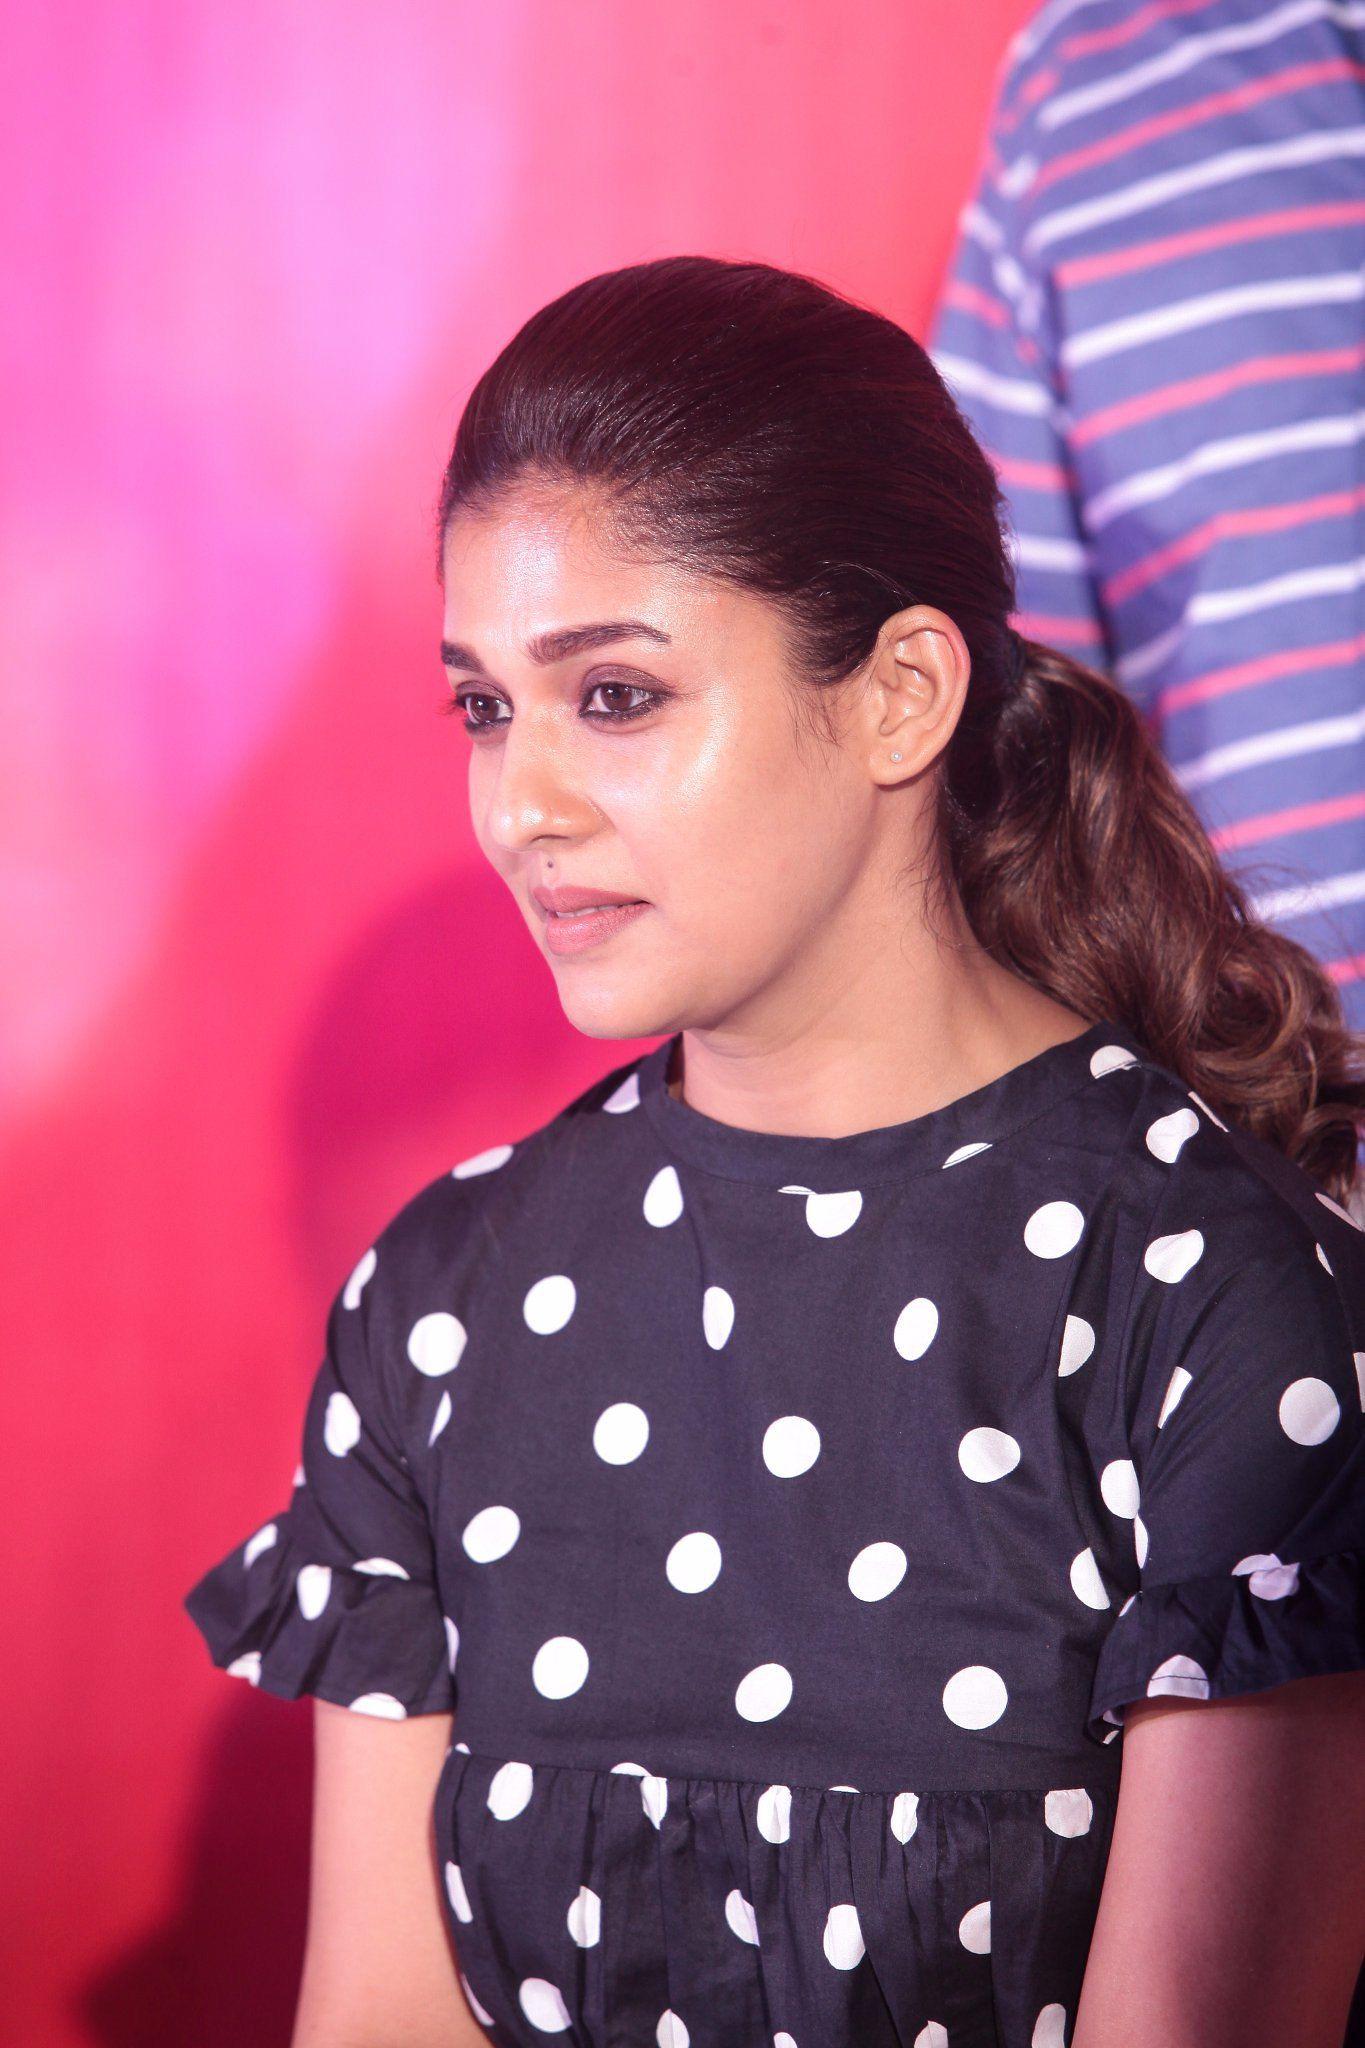 Velaikaran Farewell Day (2017) in 2020 Celebrities